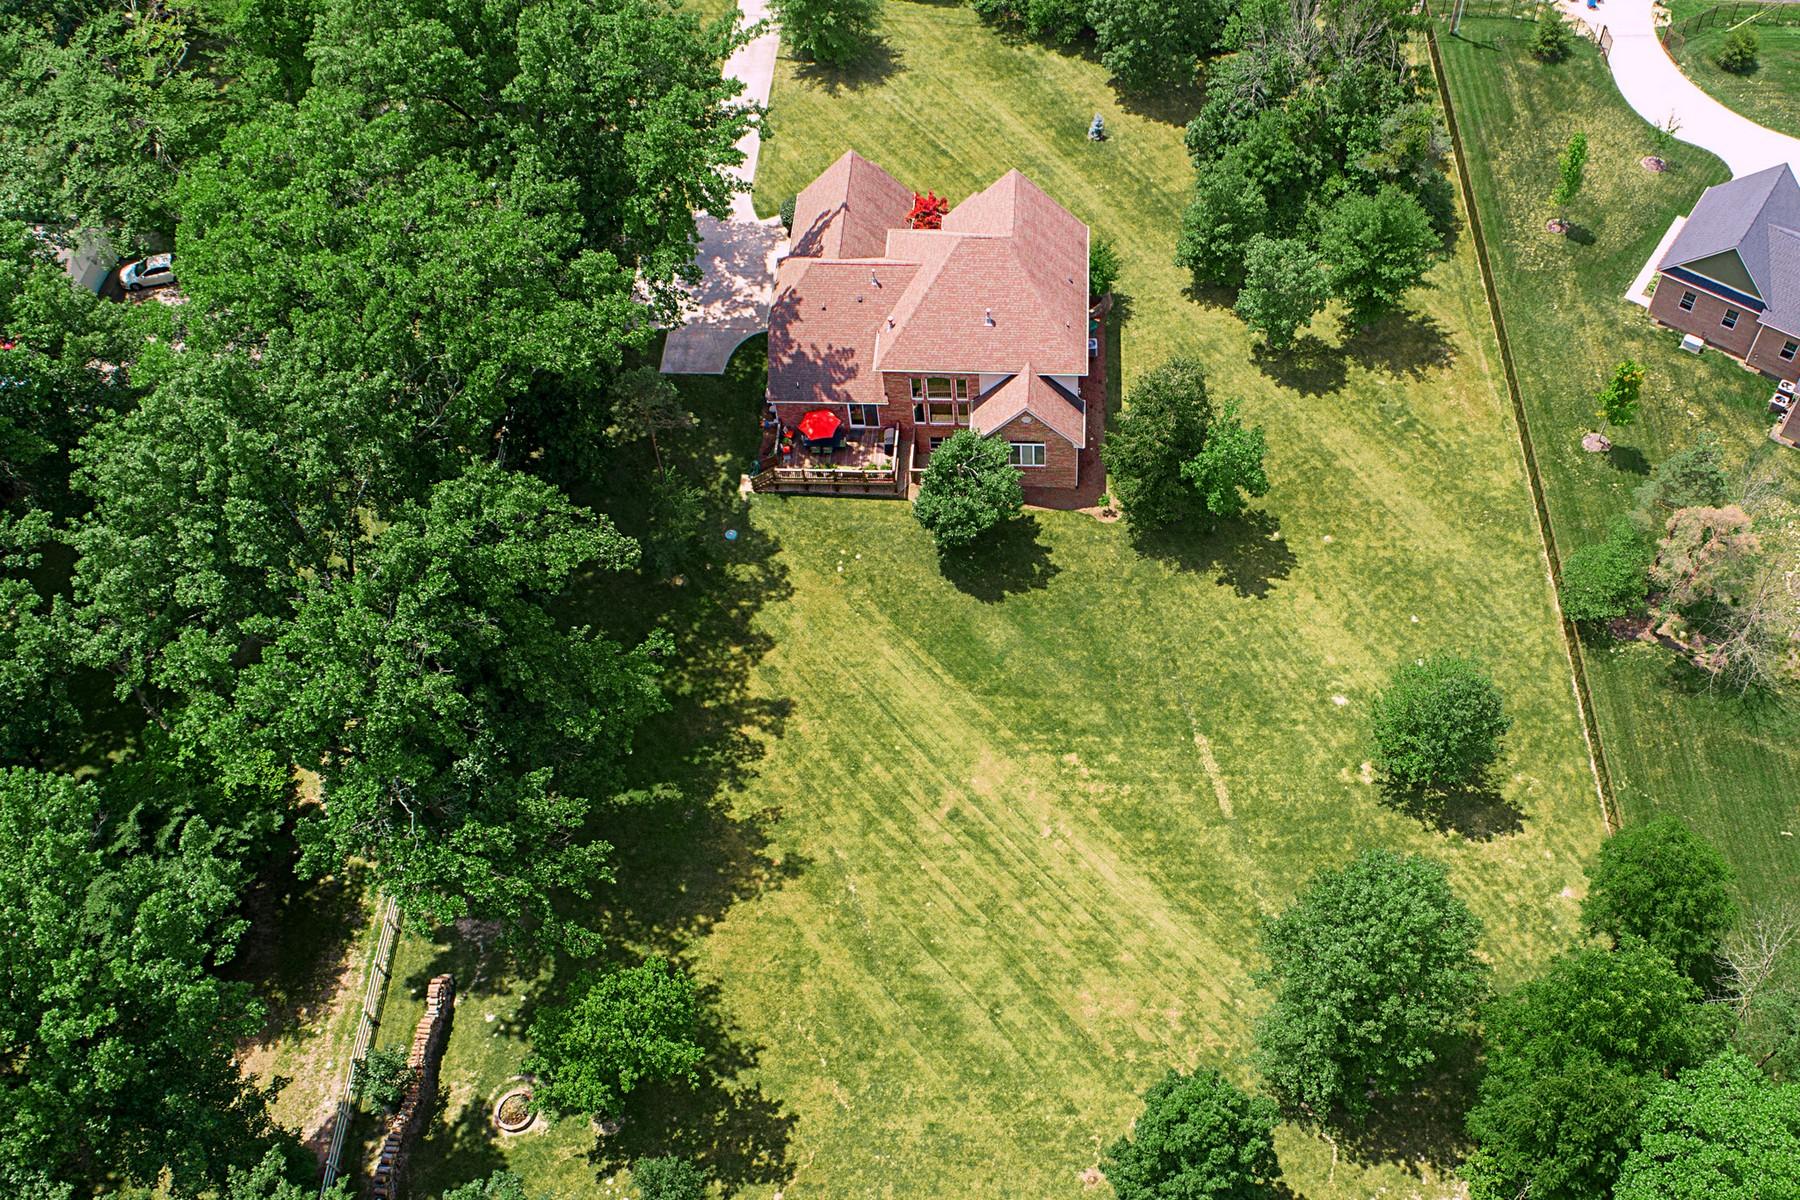 Additional photo for property listing at Classic brick home near Geist Reservoir 8545 Mud Creek Road, 印第安纳波利斯, 印第安纳州 46256 美国